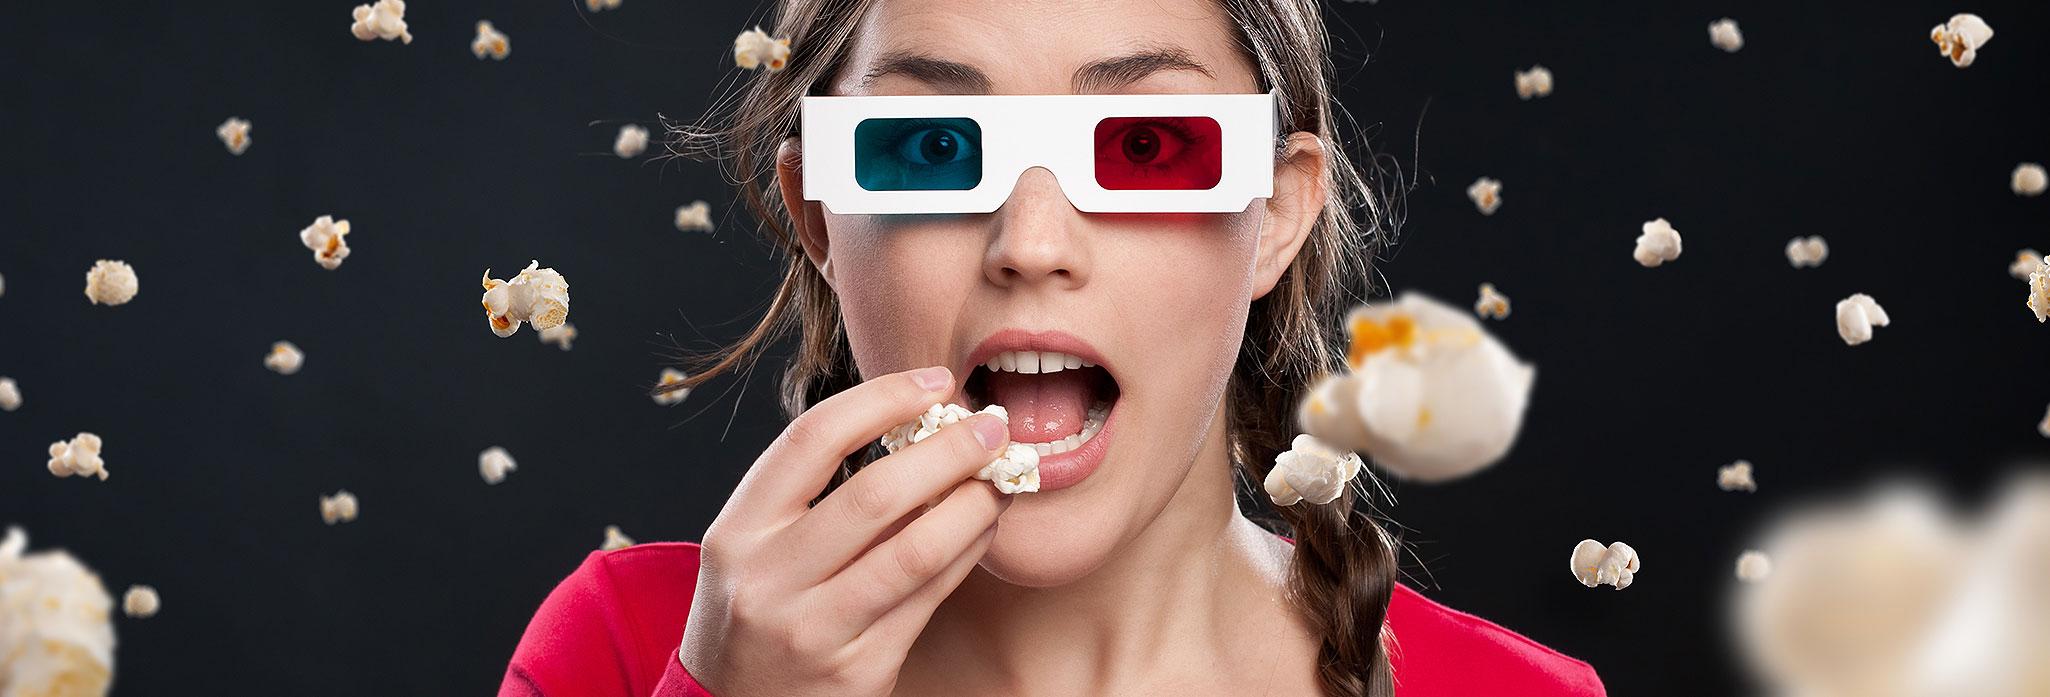 3DMoviegoer Woman Eating Popcorn